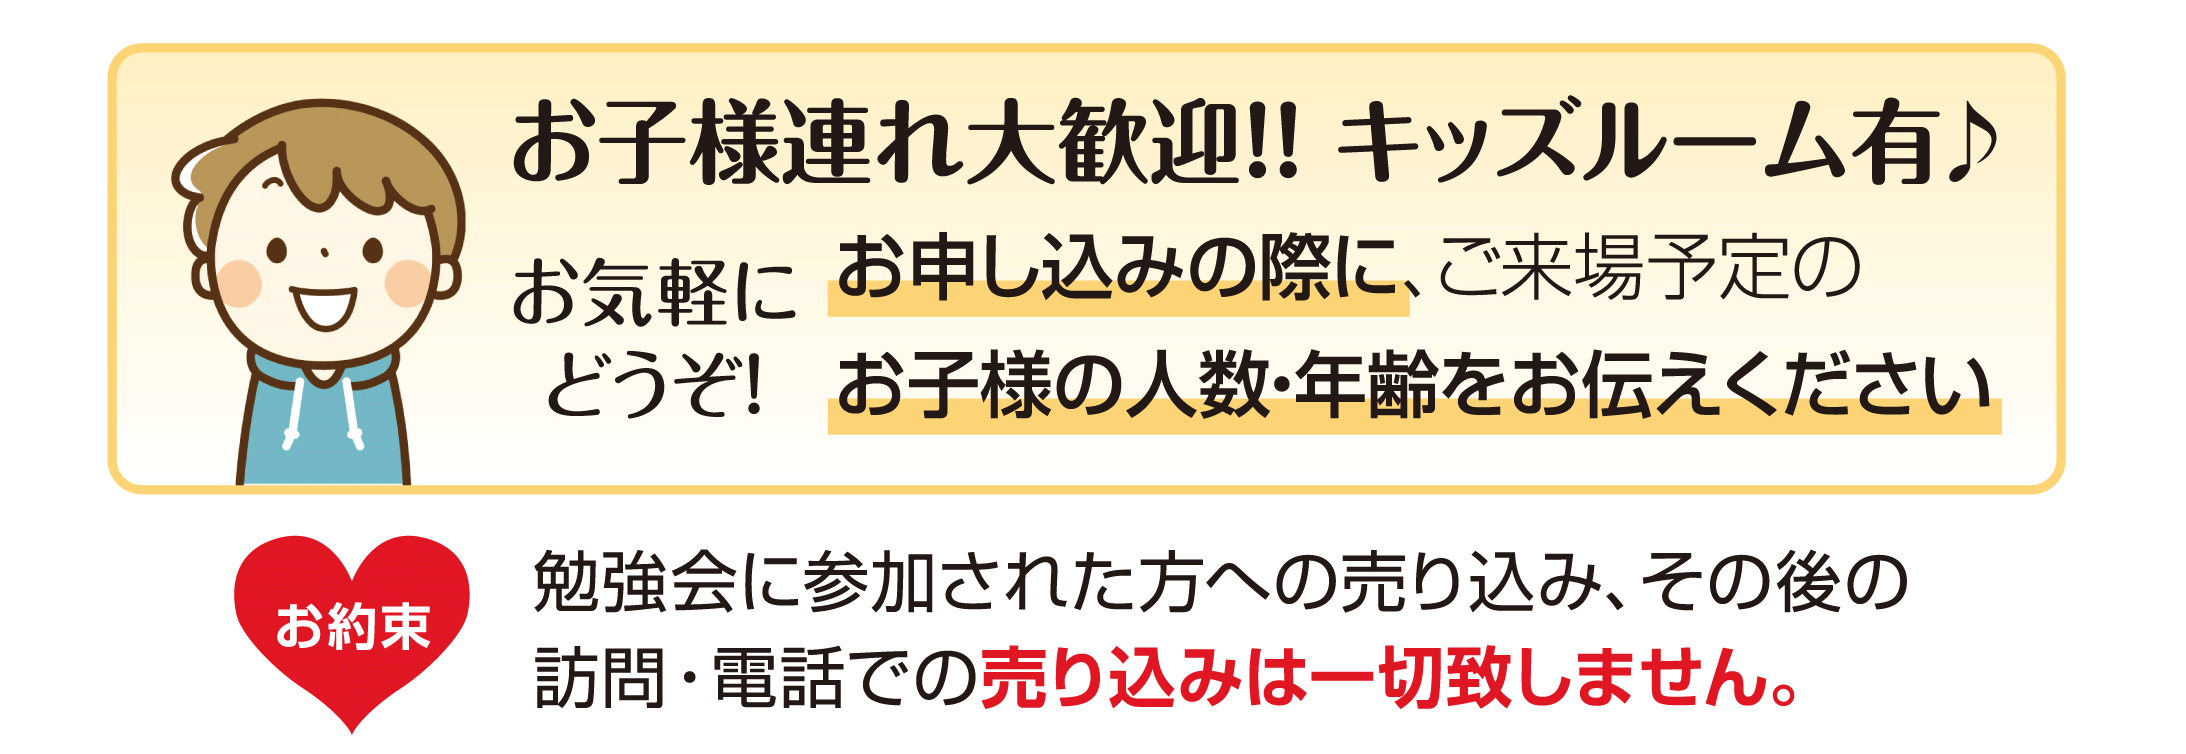 bemkyoukaichizu01